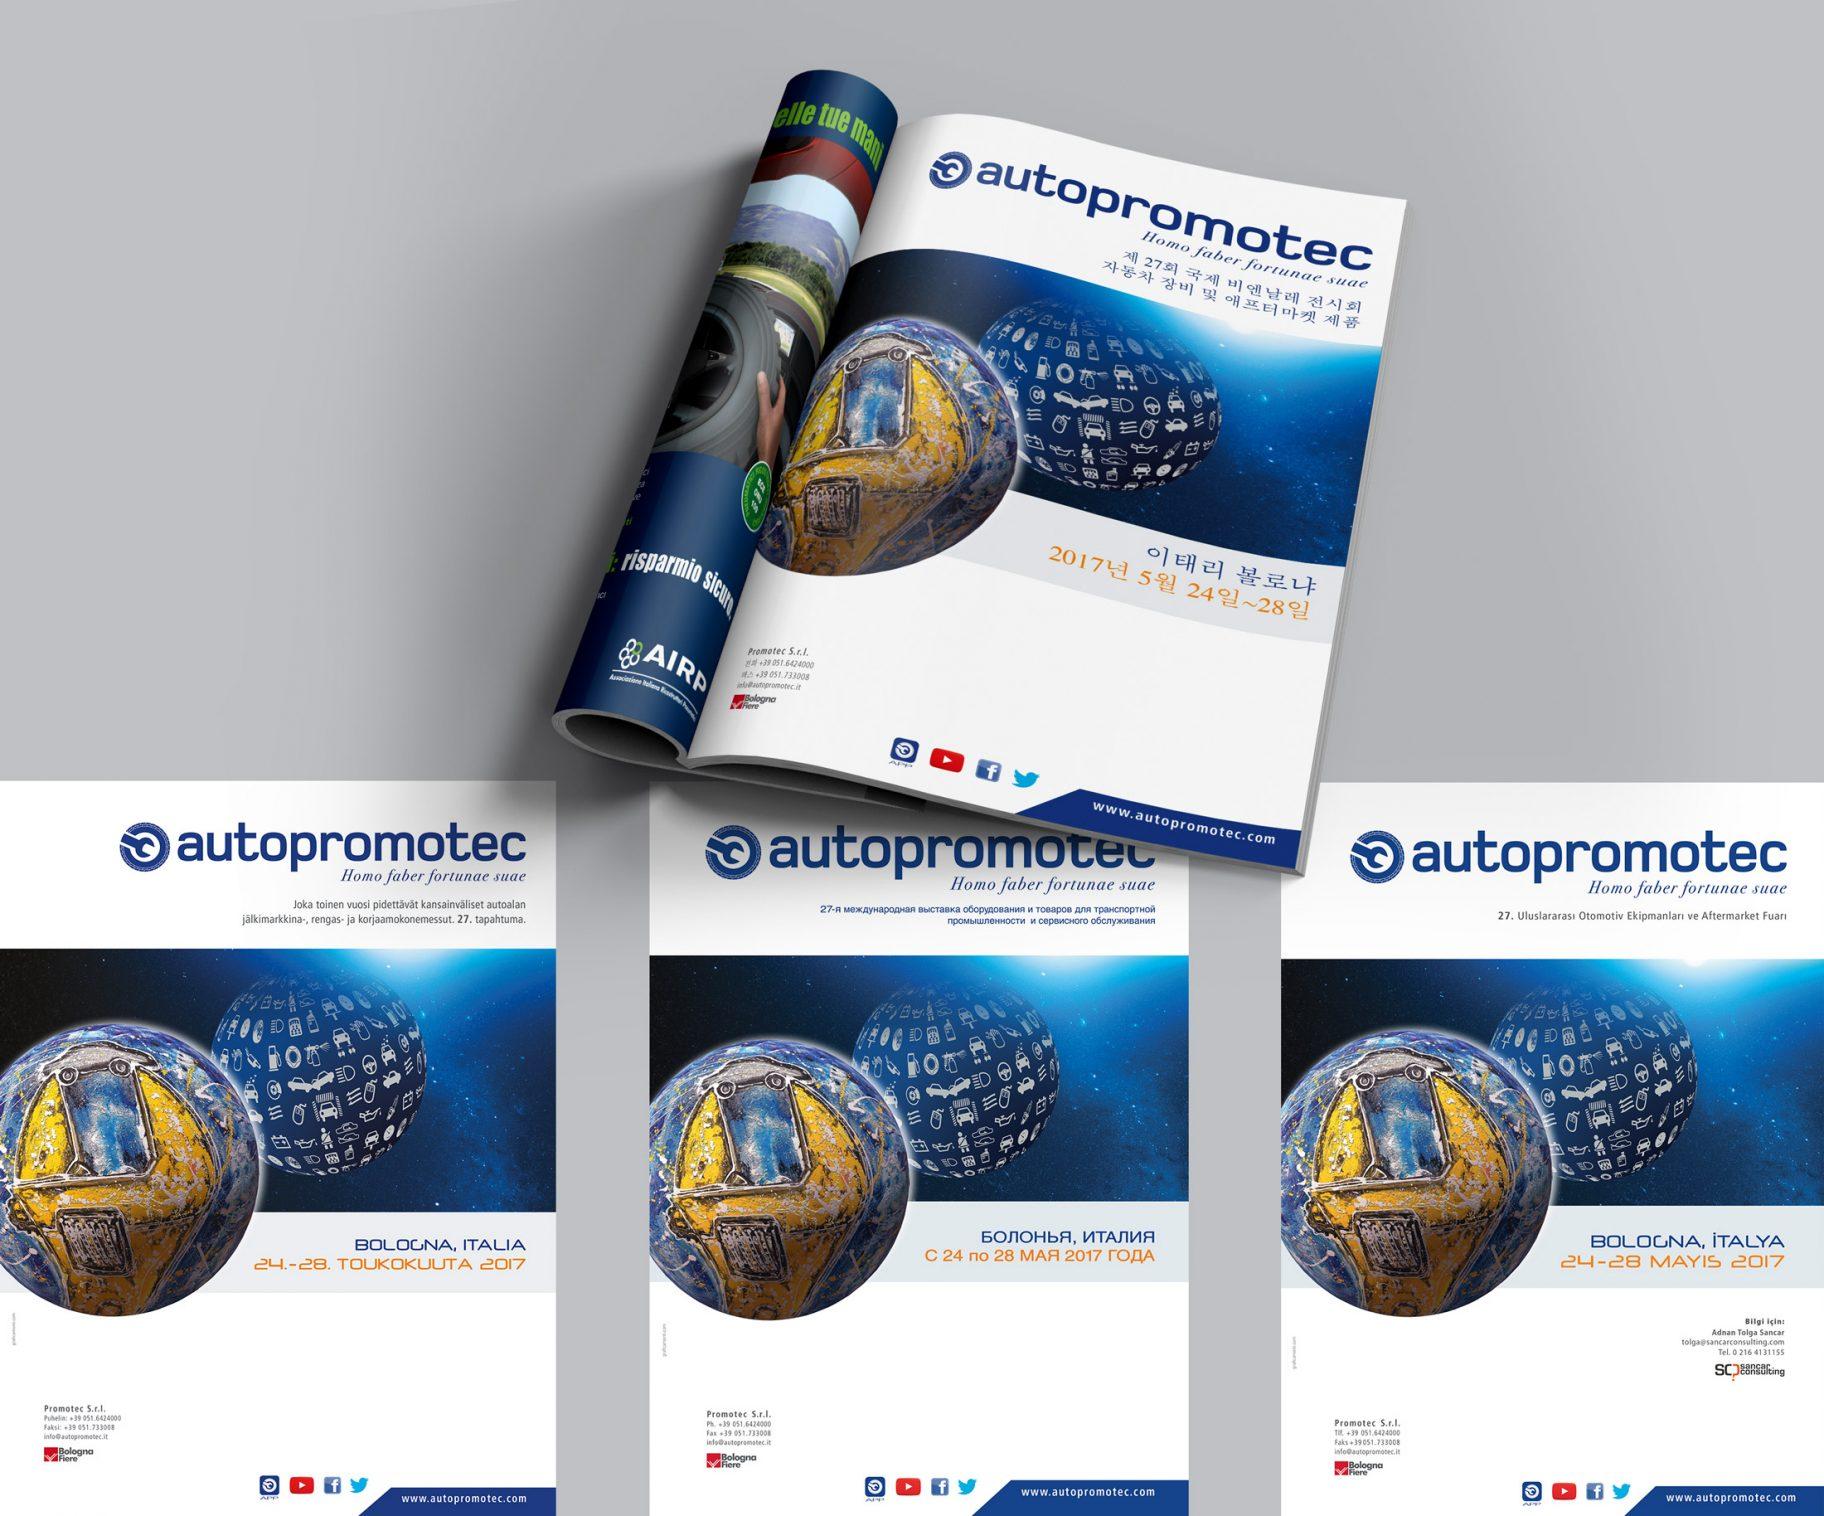 Autopromotec-fiera-2017-pagine-pubblicitarie